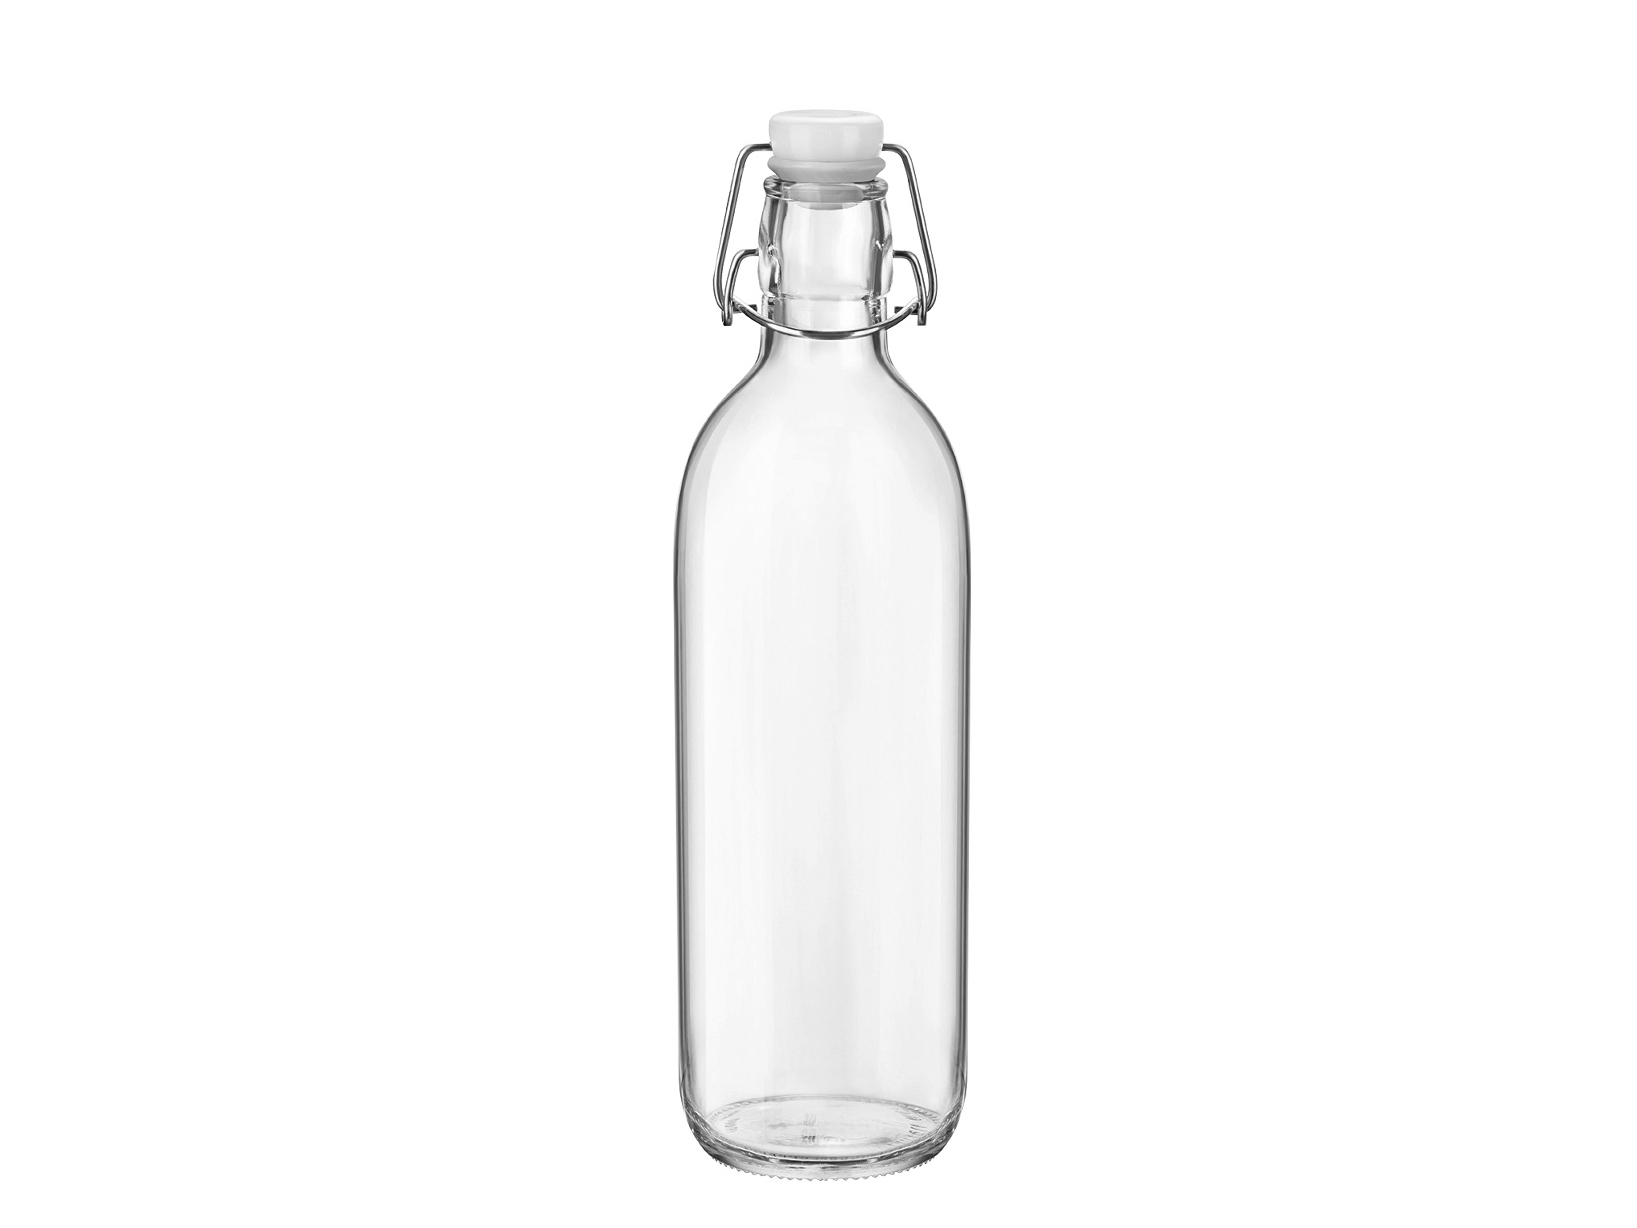 Acquista Set 6 Bottiglia Vetro Emilia 1 17505309   Glooke.com